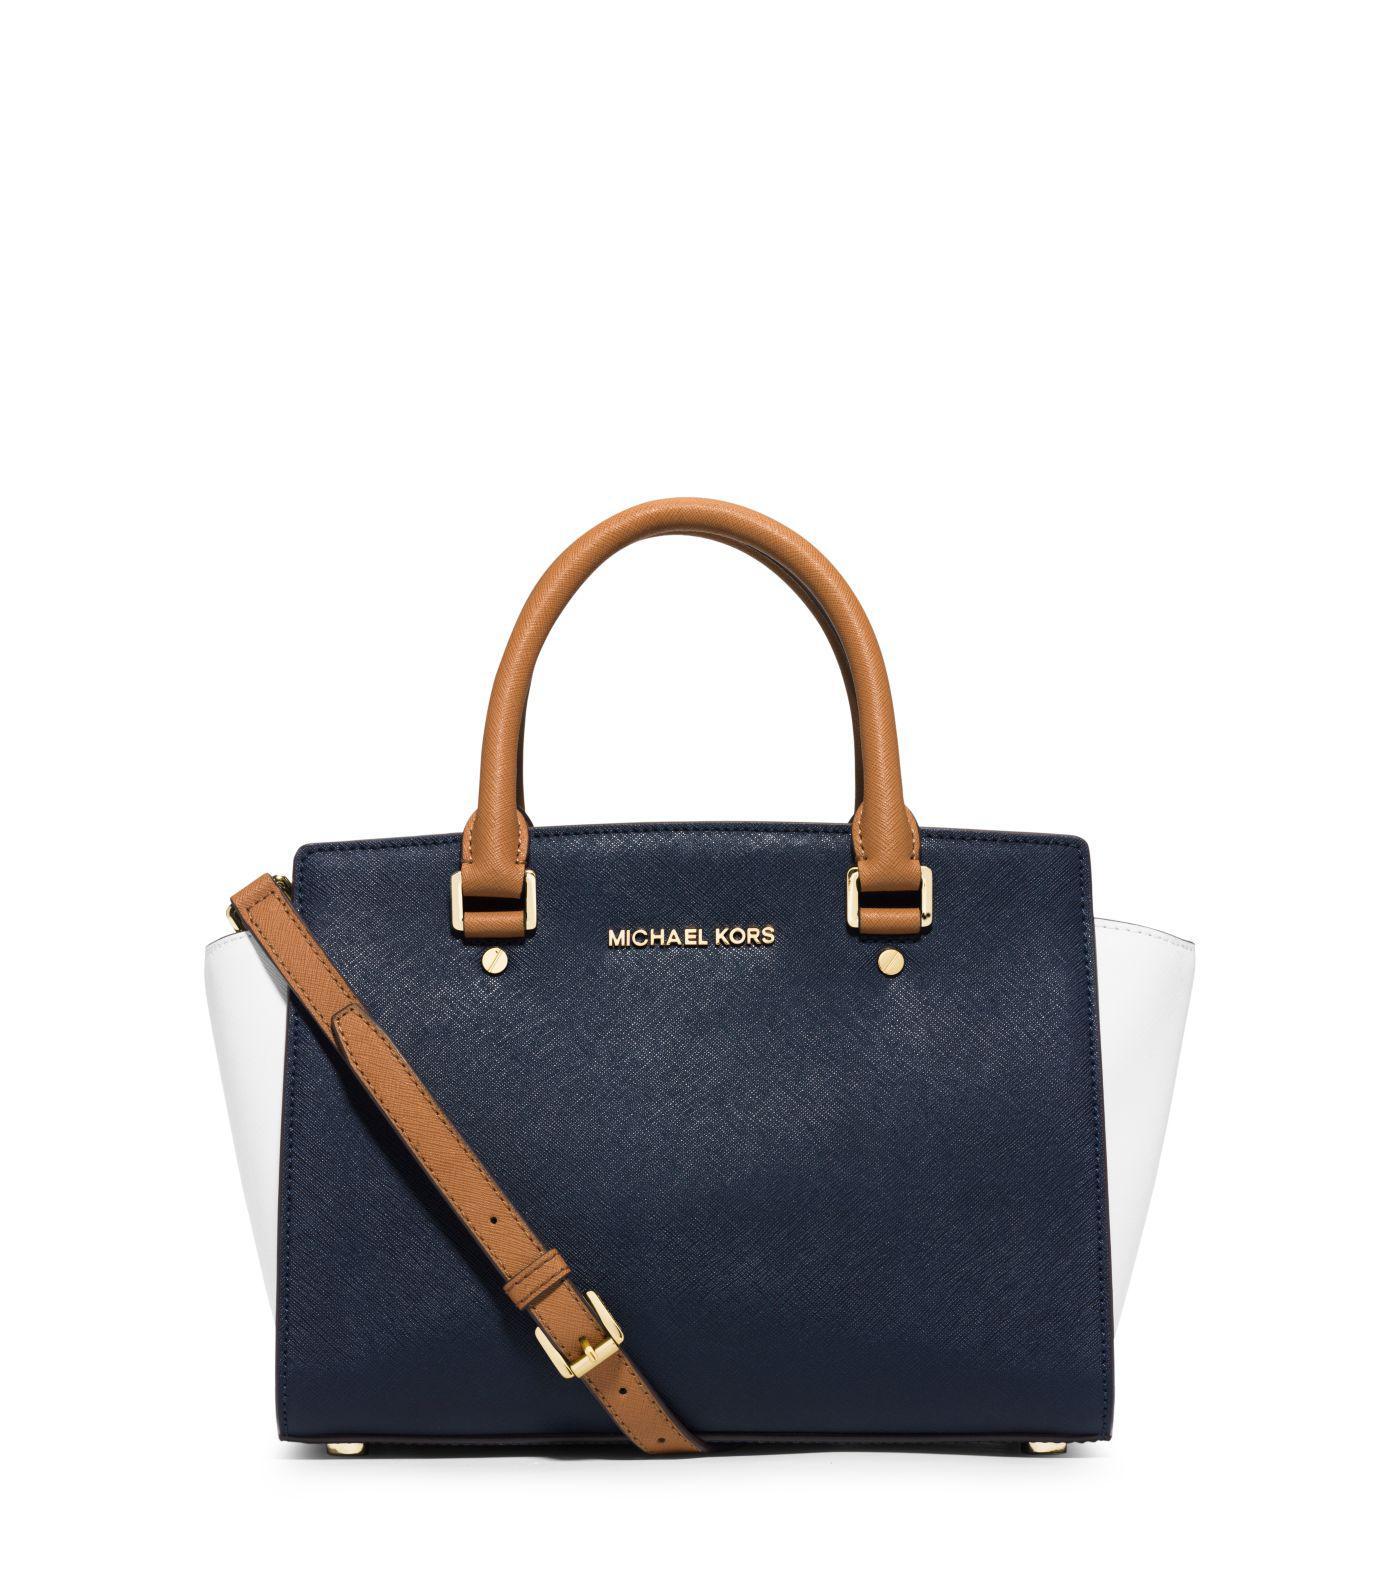 Lyst - Michael Kors Selma Medium Color-block Leather Satchel in Blue 17e20b109fbaf